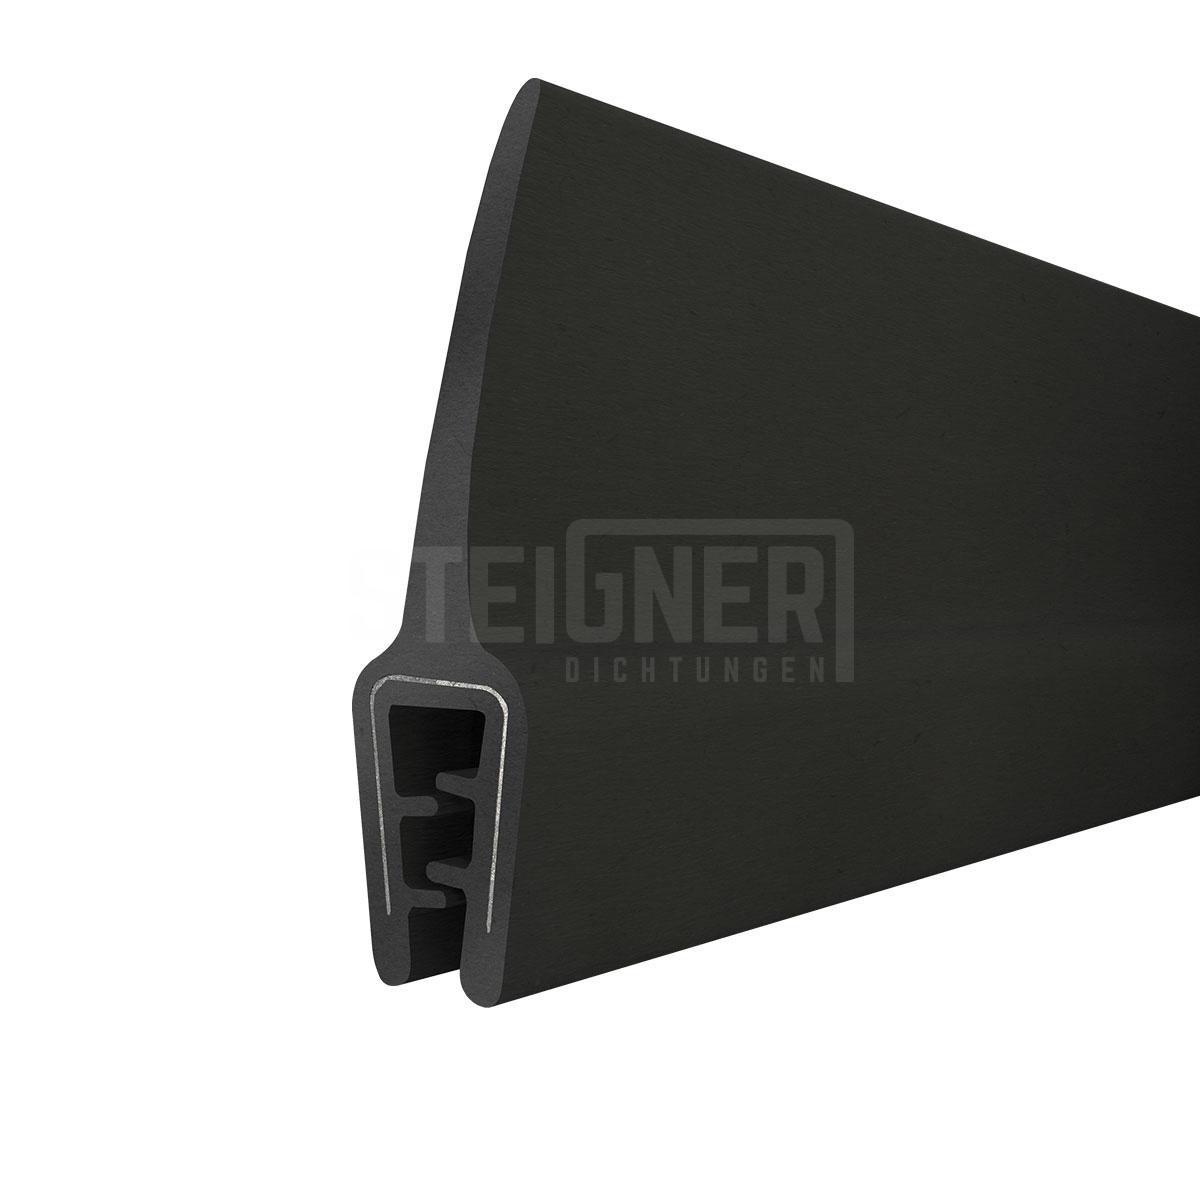 meterware dichtungsprofil t 45 kofferraumdichtung t rdichtung kantenschutz keder ebay. Black Bedroom Furniture Sets. Home Design Ideas